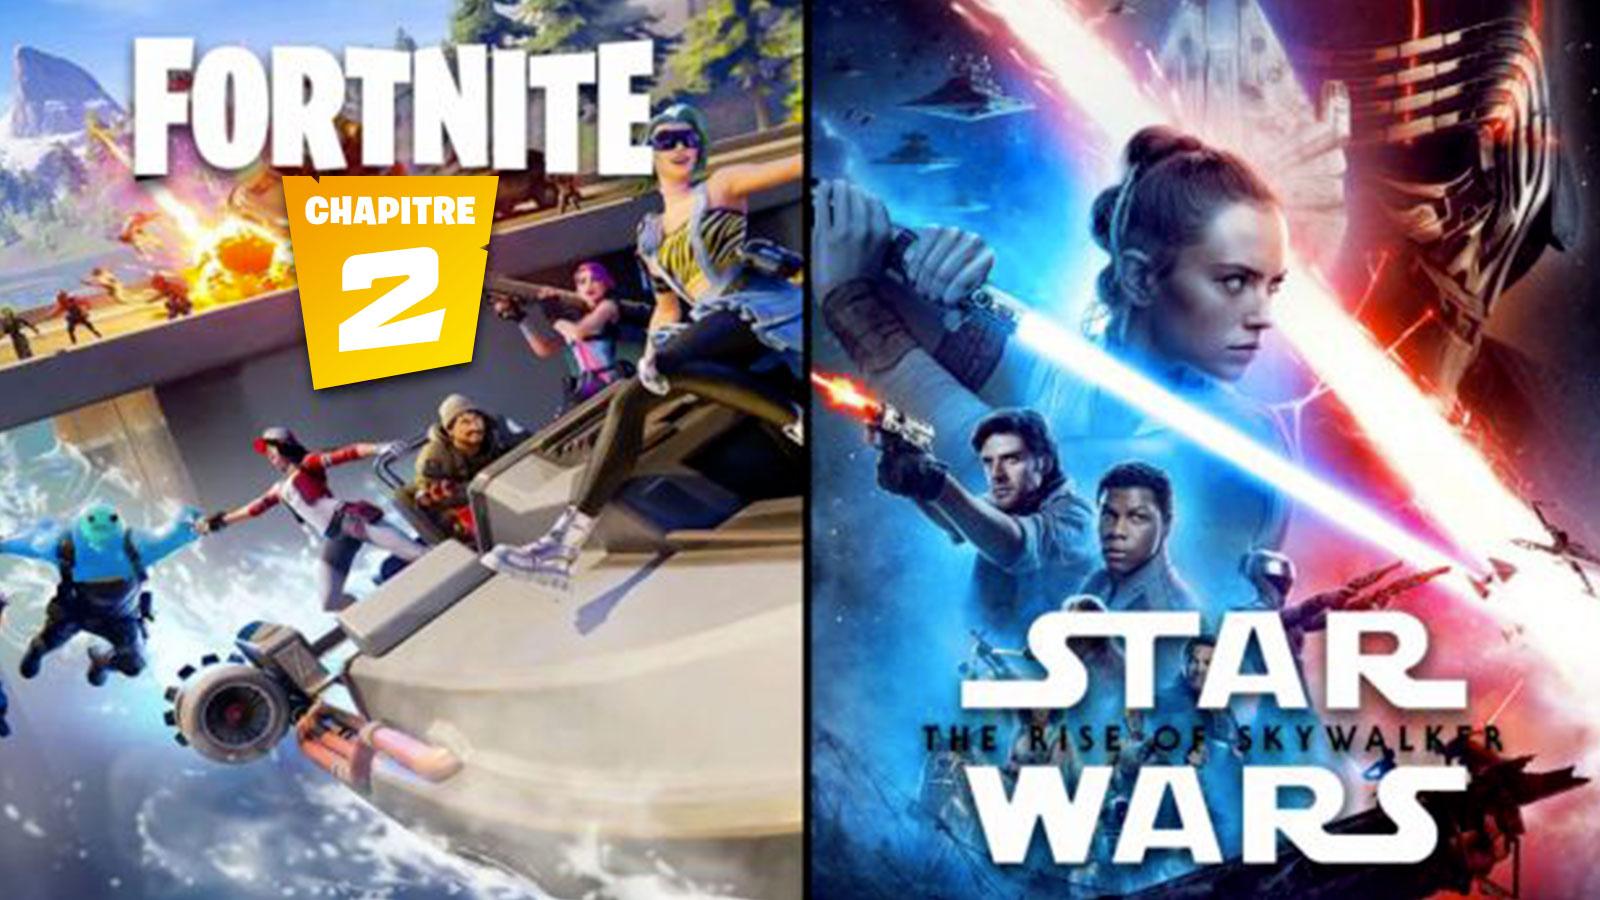 Epic Games / Disney